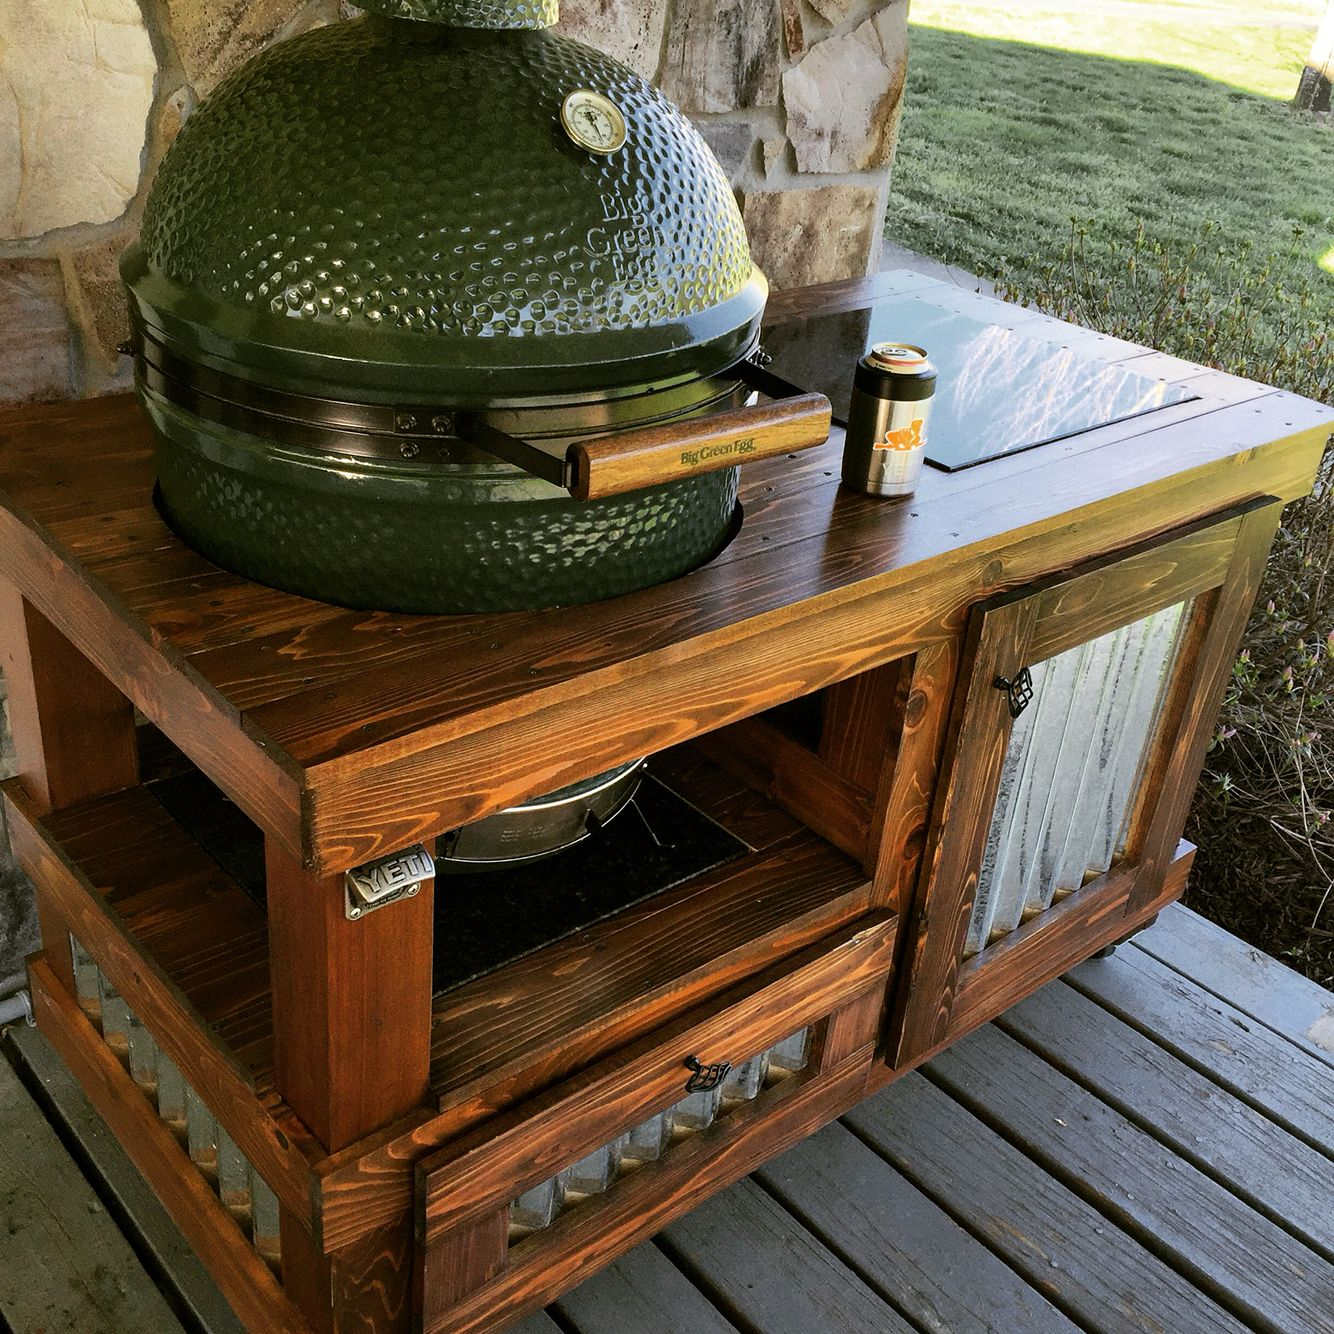 Kamado Joe Outdoor Kitchen: Large Big Green Egg Table. Western Red, Minwax Special